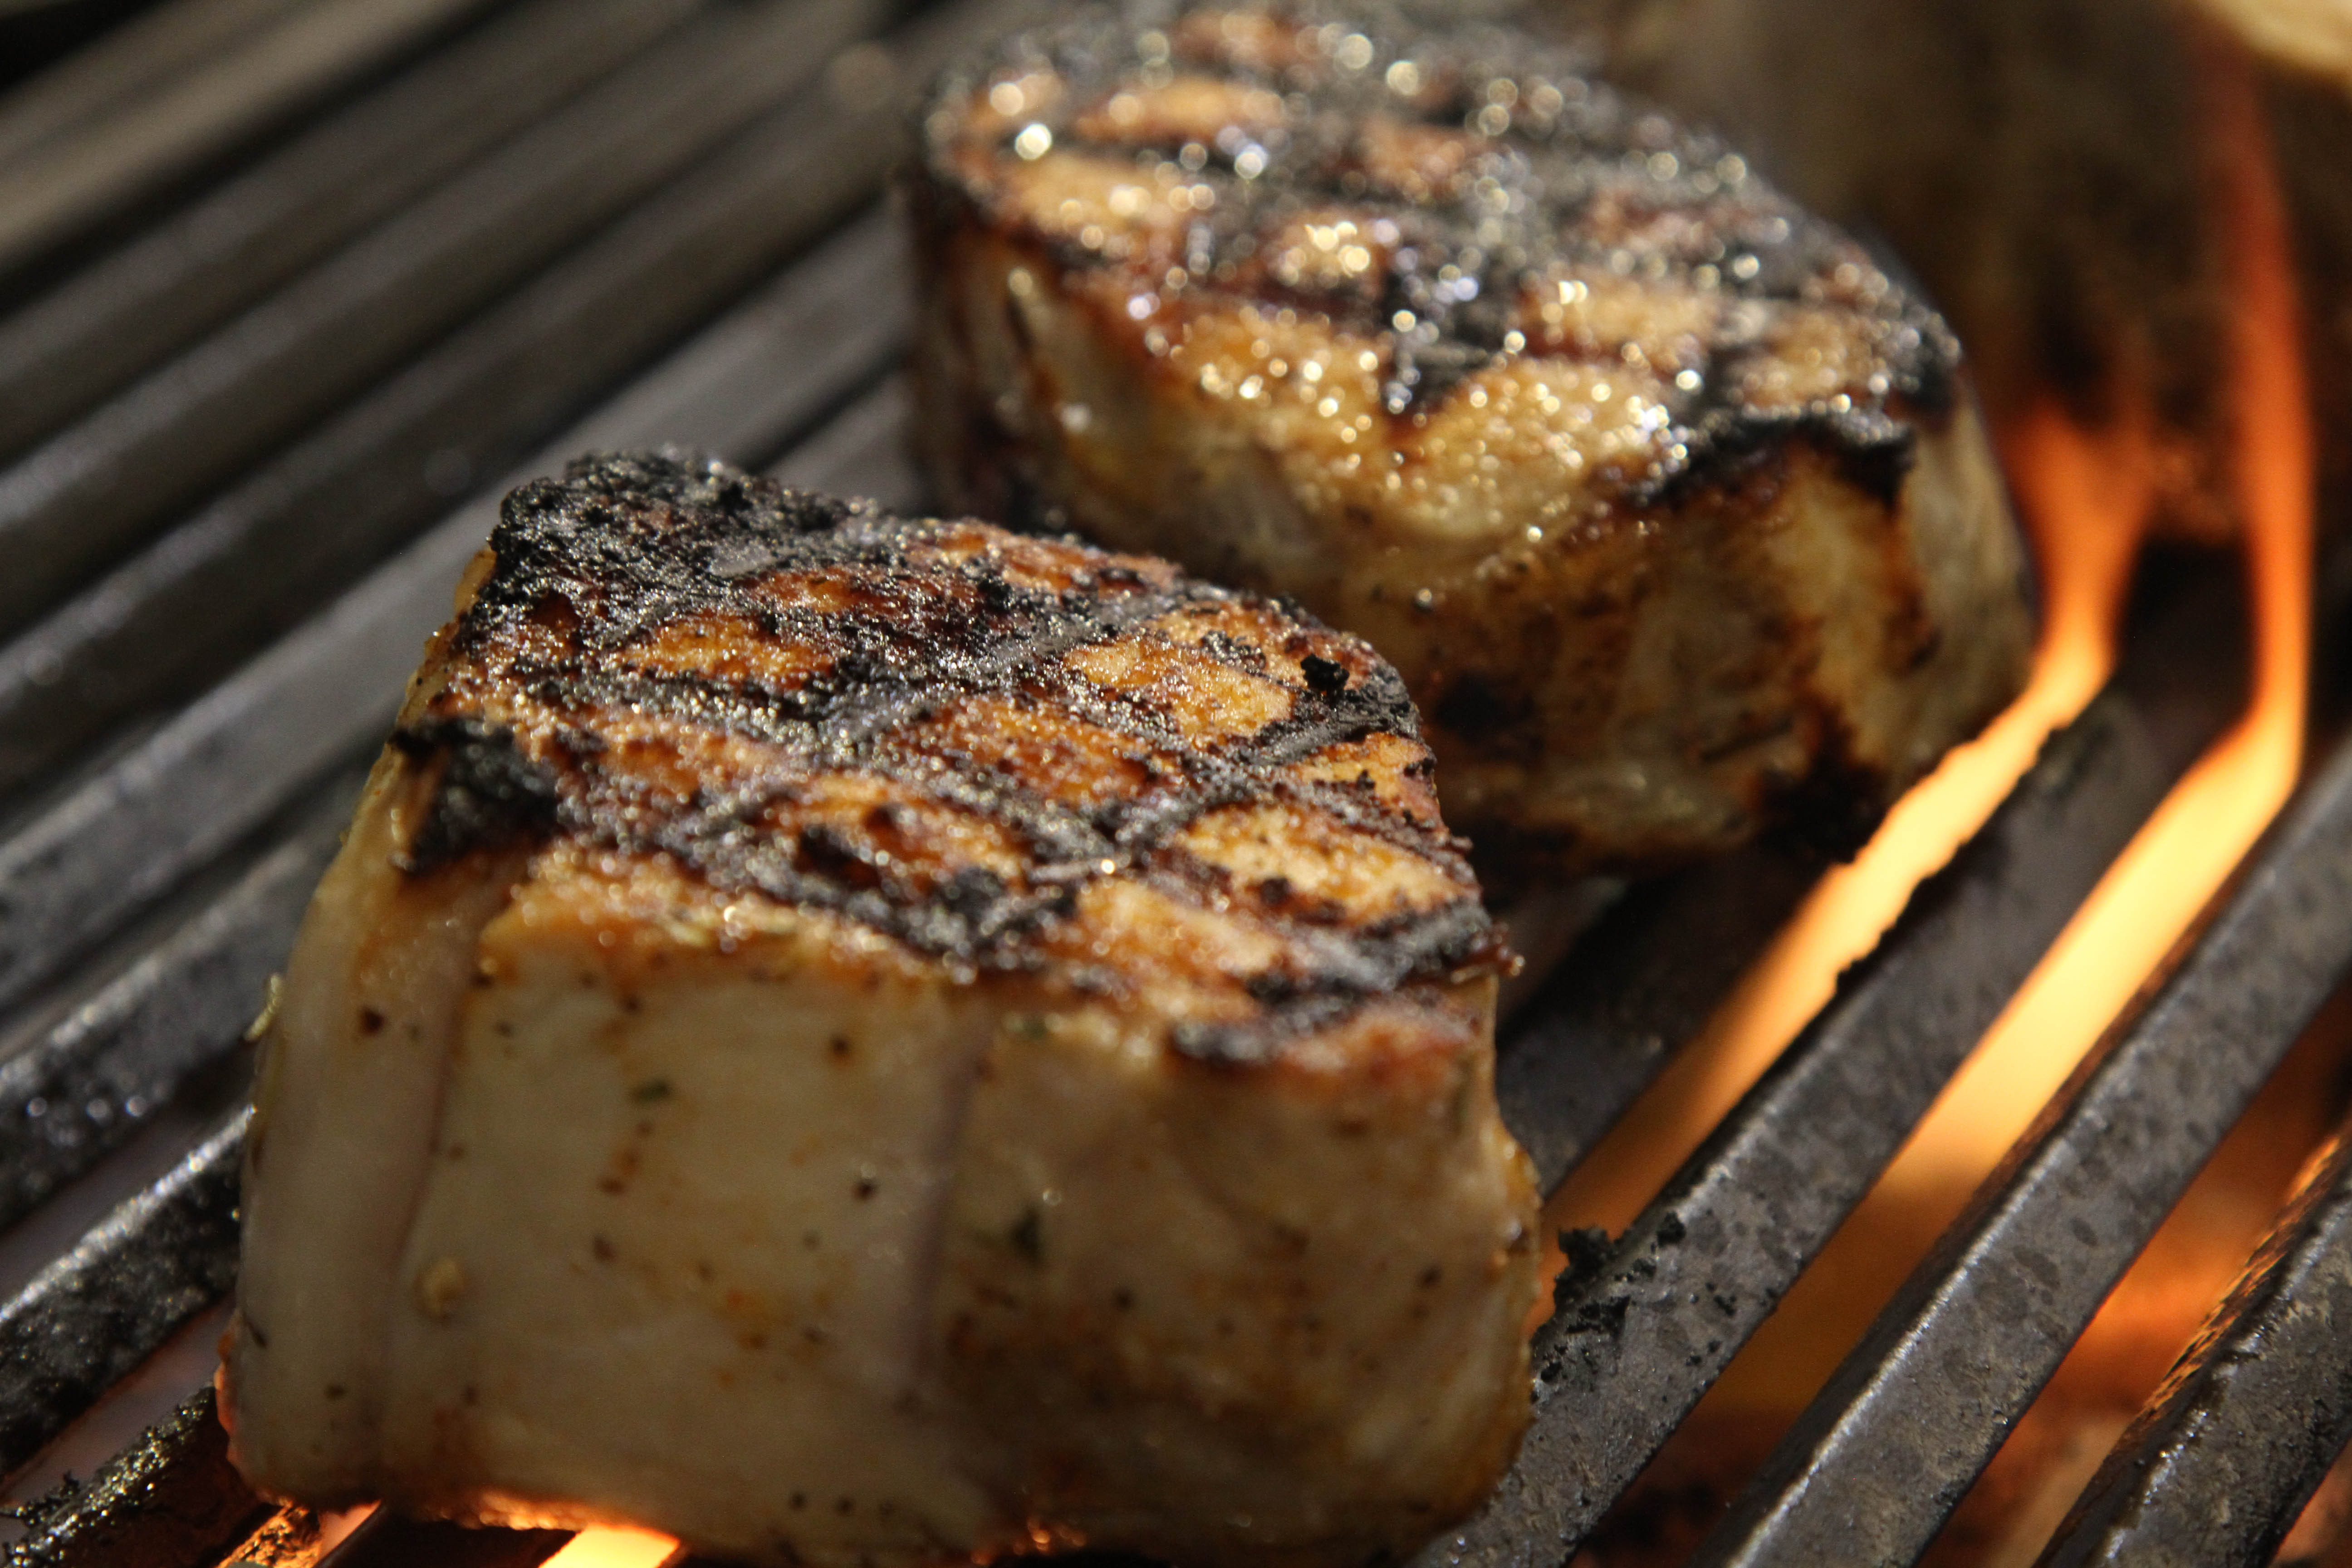 Temp To Bake Pork Chops  Key Temps Juicy Grilled Pork Chops